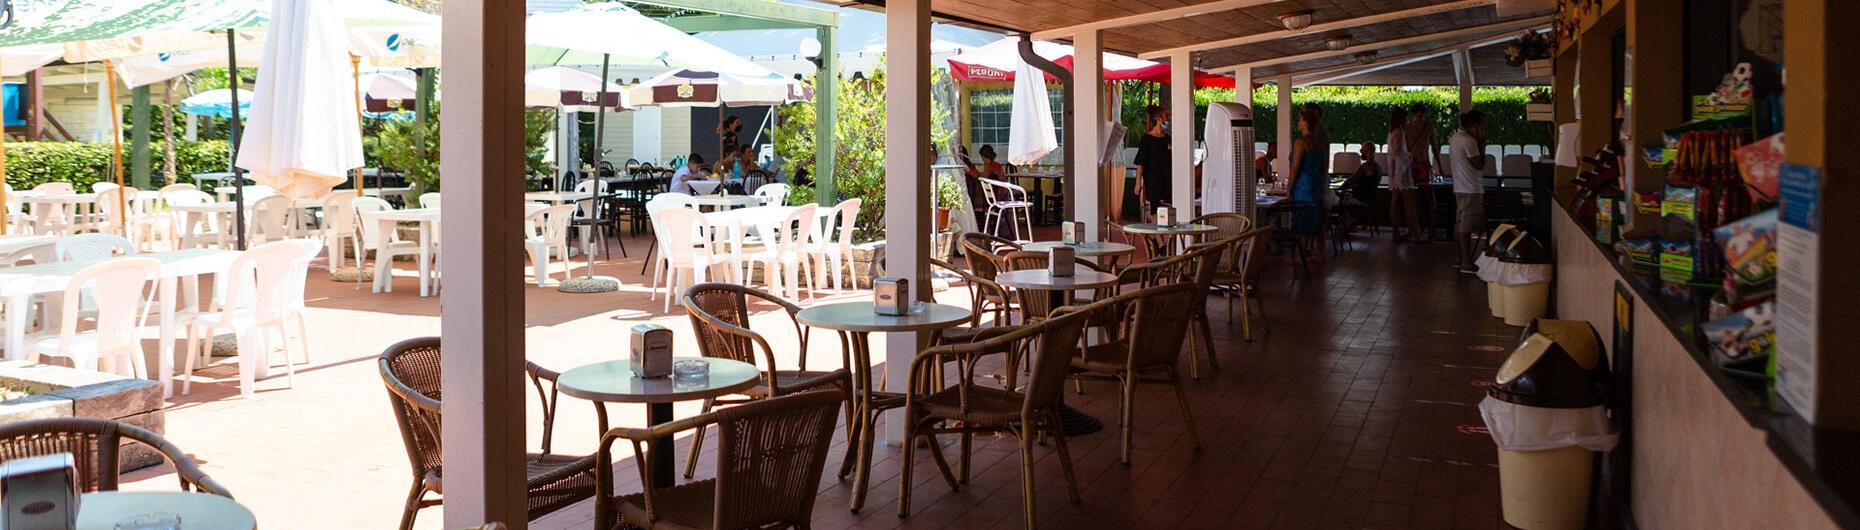 vacanzespinnaker it ristorante 004